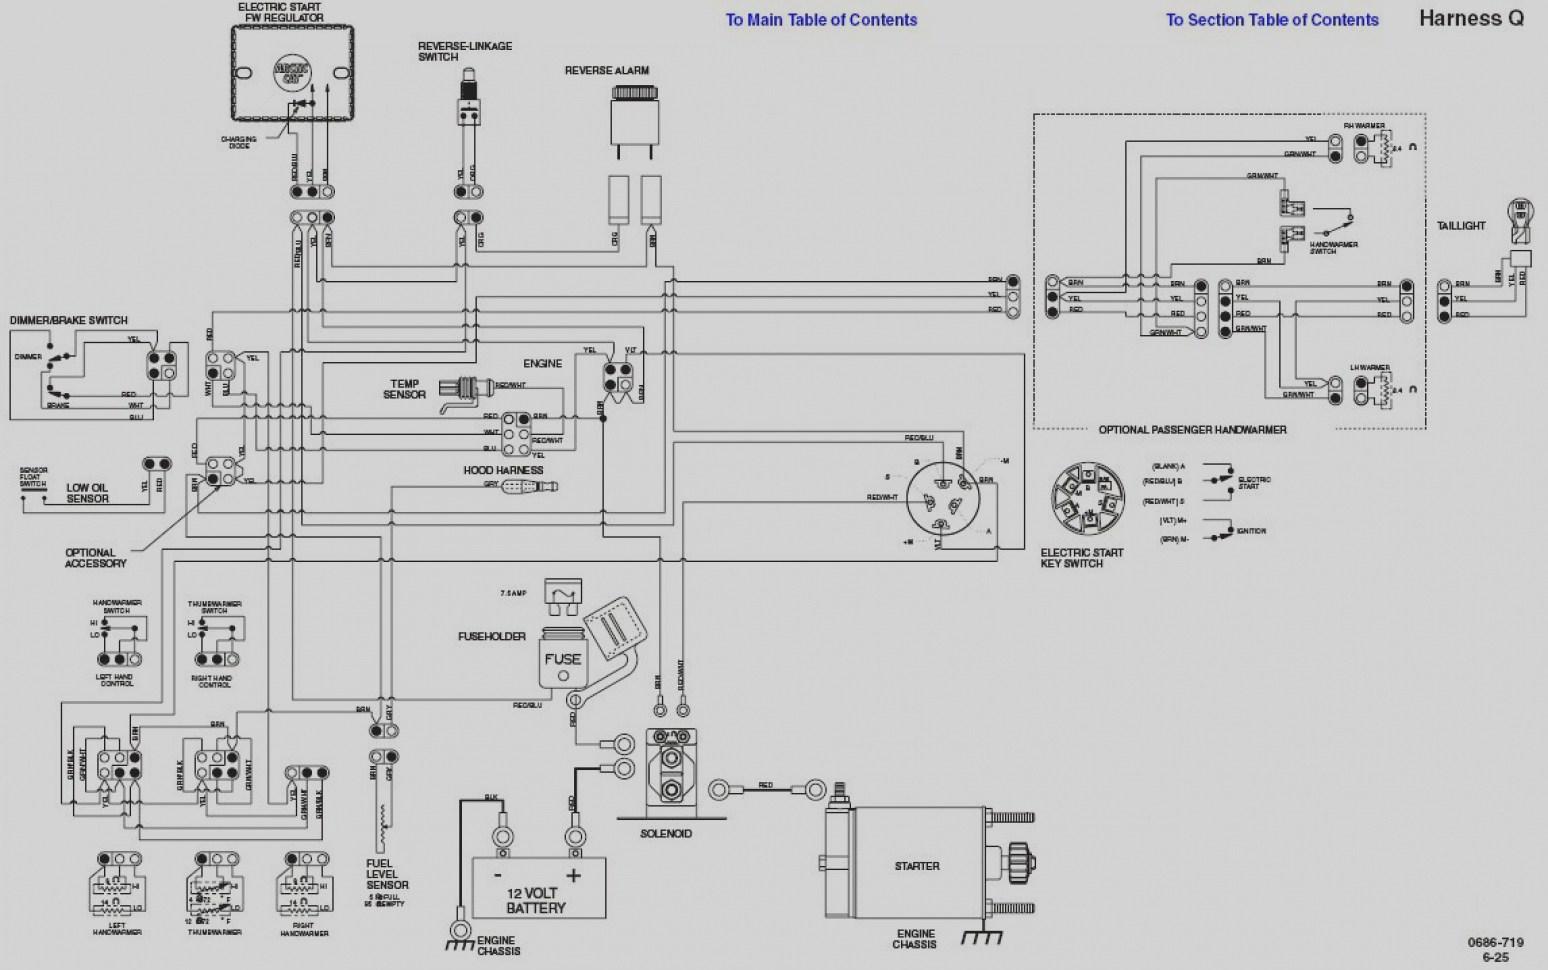 EC_2971] F350 Fuse Box Diagram In Addition Polaris Sportsman 500 Wiring  Diagram Wiring DiagramIlari Viewor Mohammedshrine Librar Wiring 101